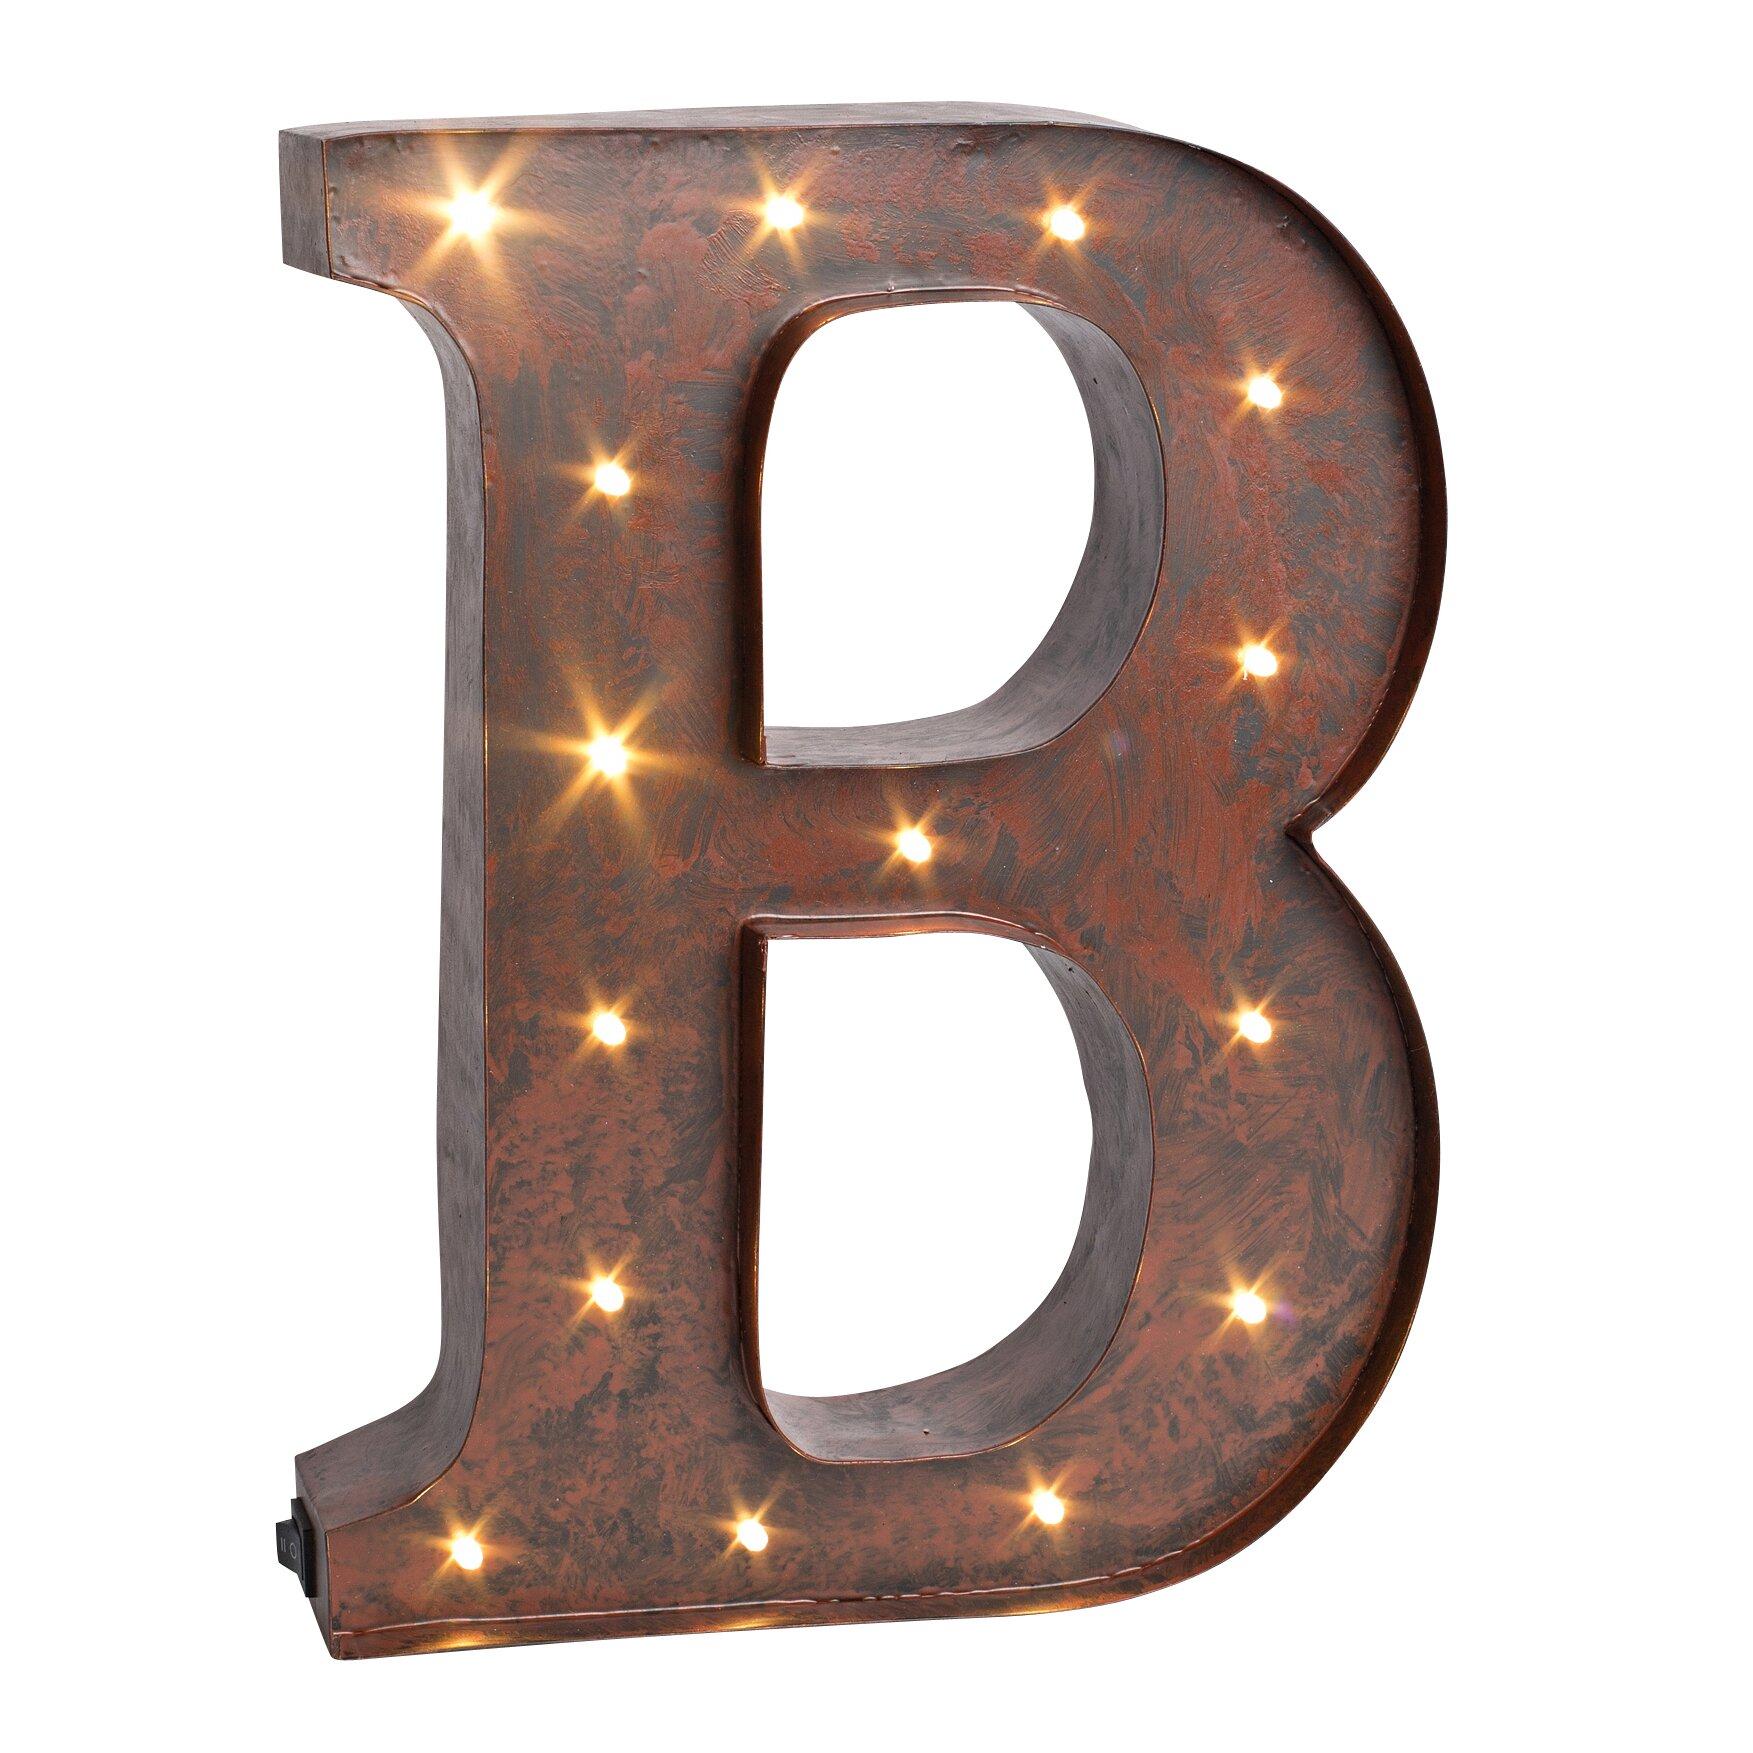 LED Lighted Metal Letter